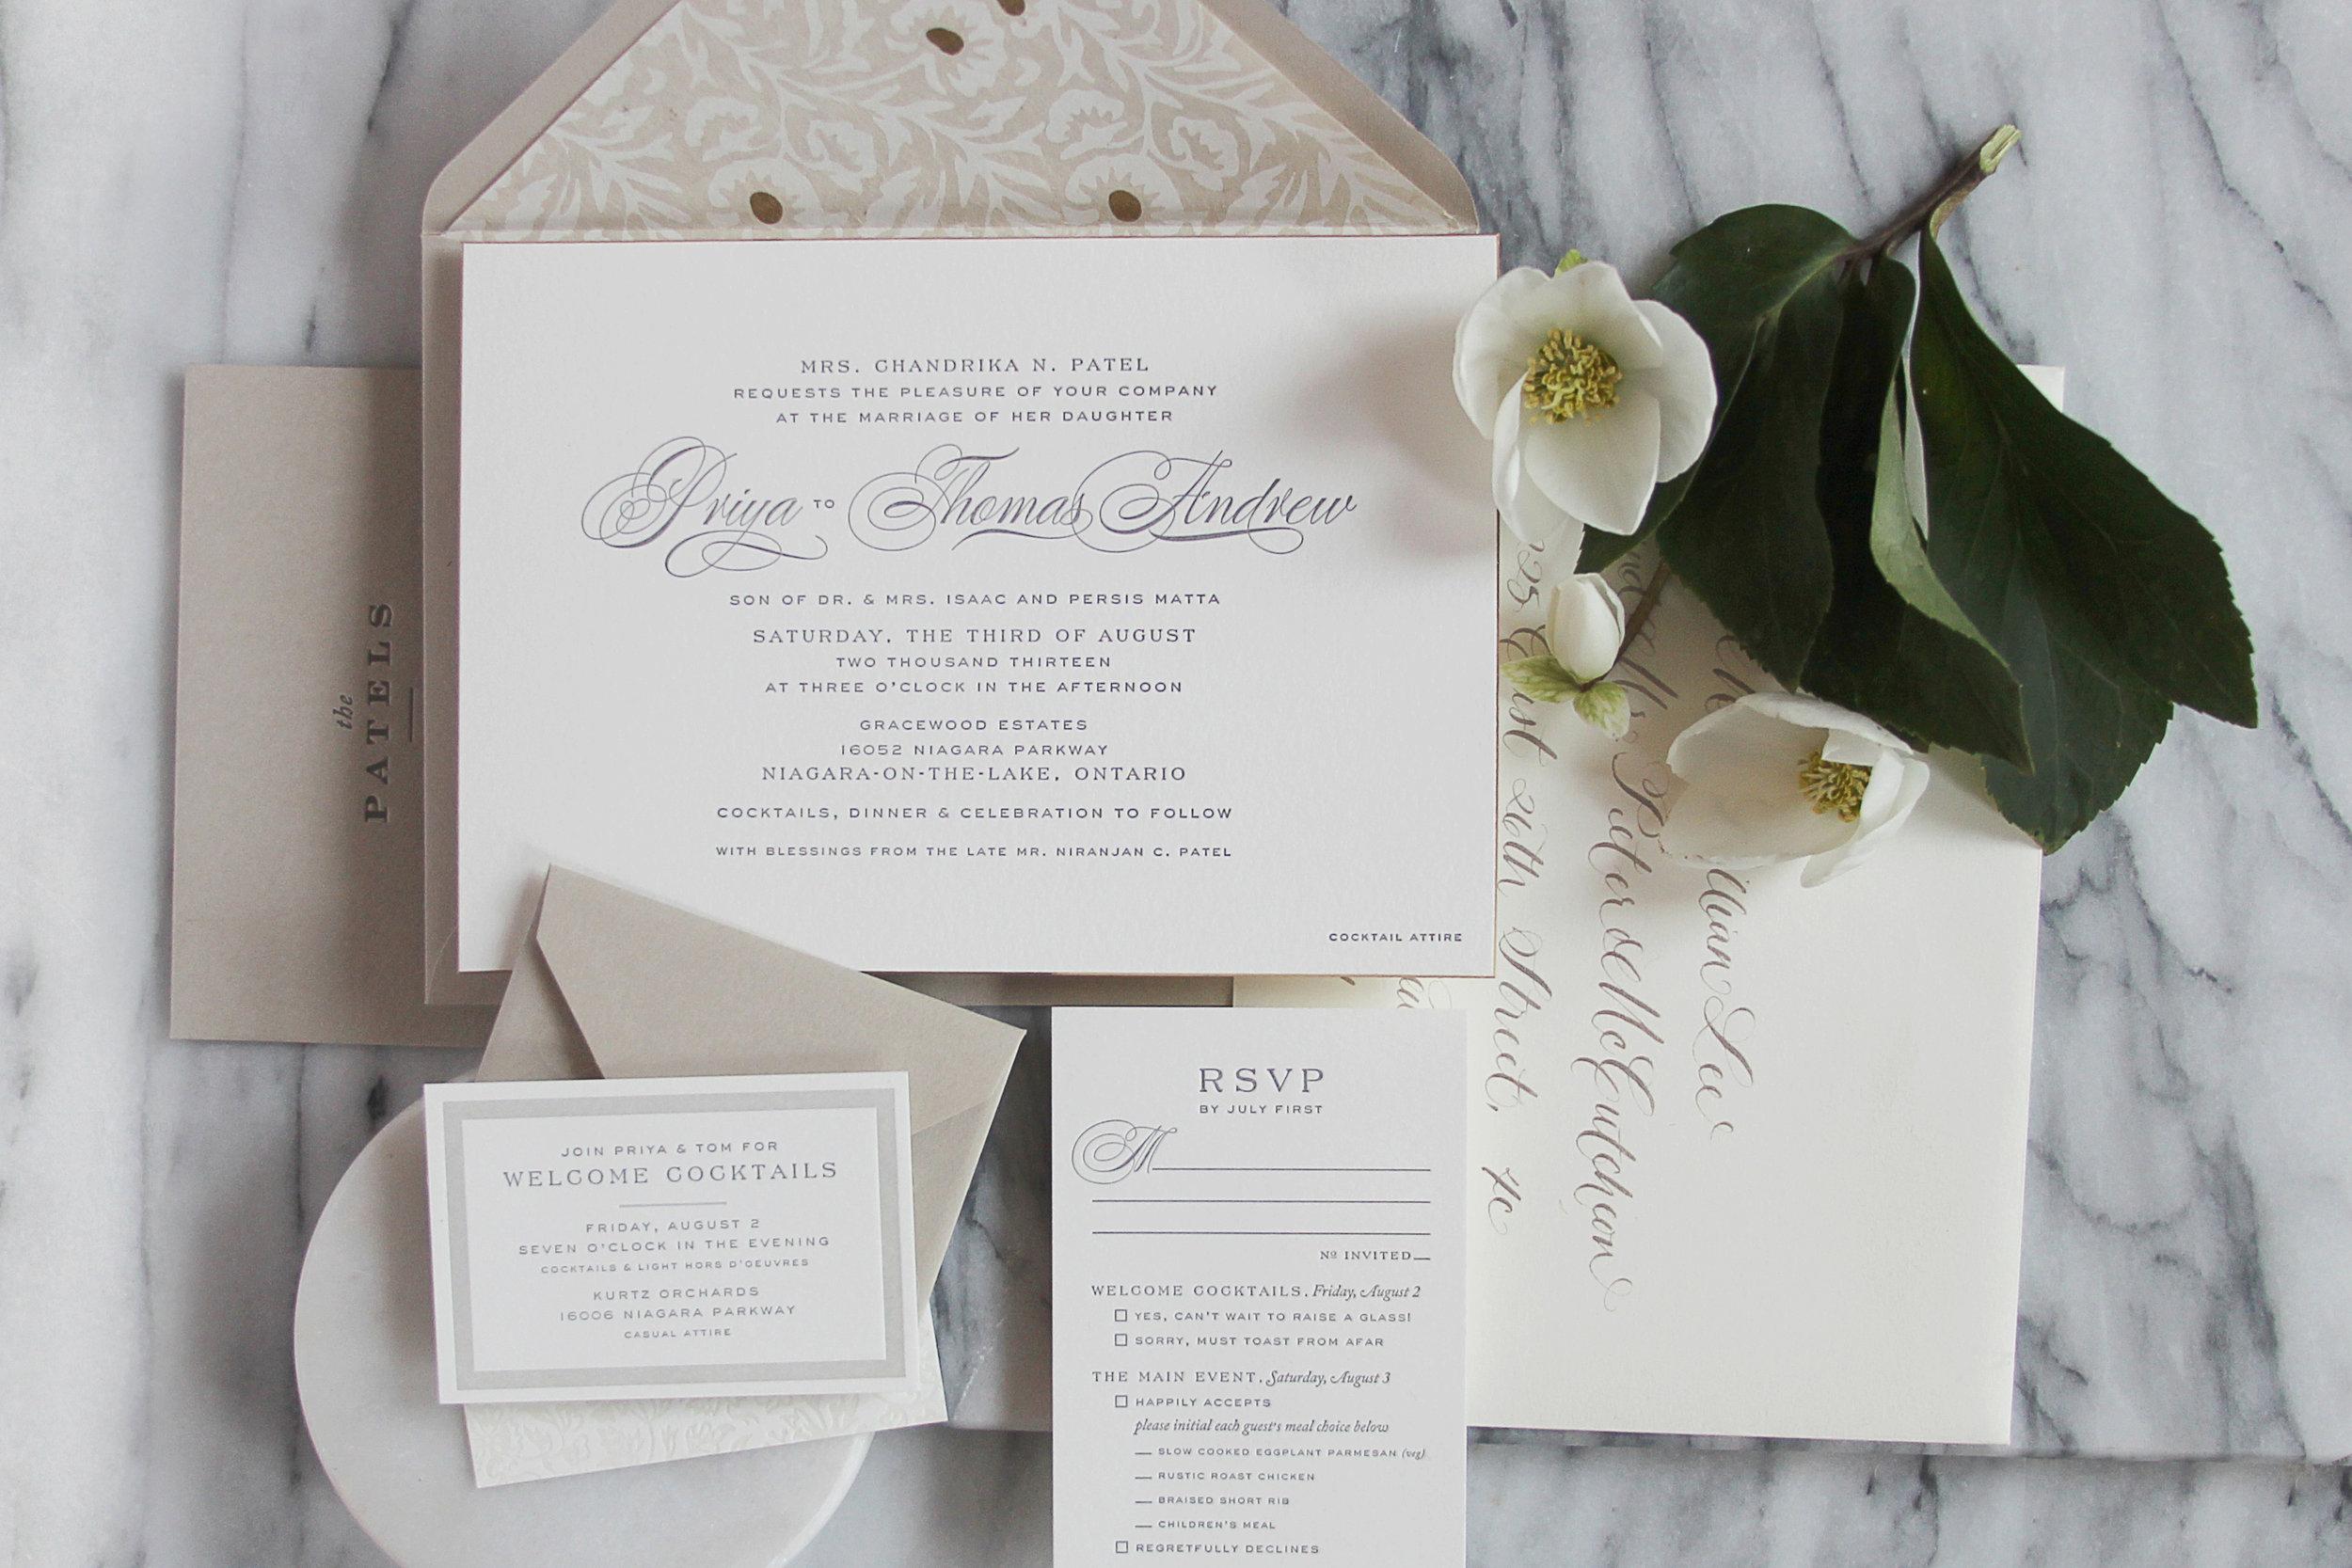 Thomas-Priya-Tiffany-Weddings-Niru-Baku1c-6835.jpg